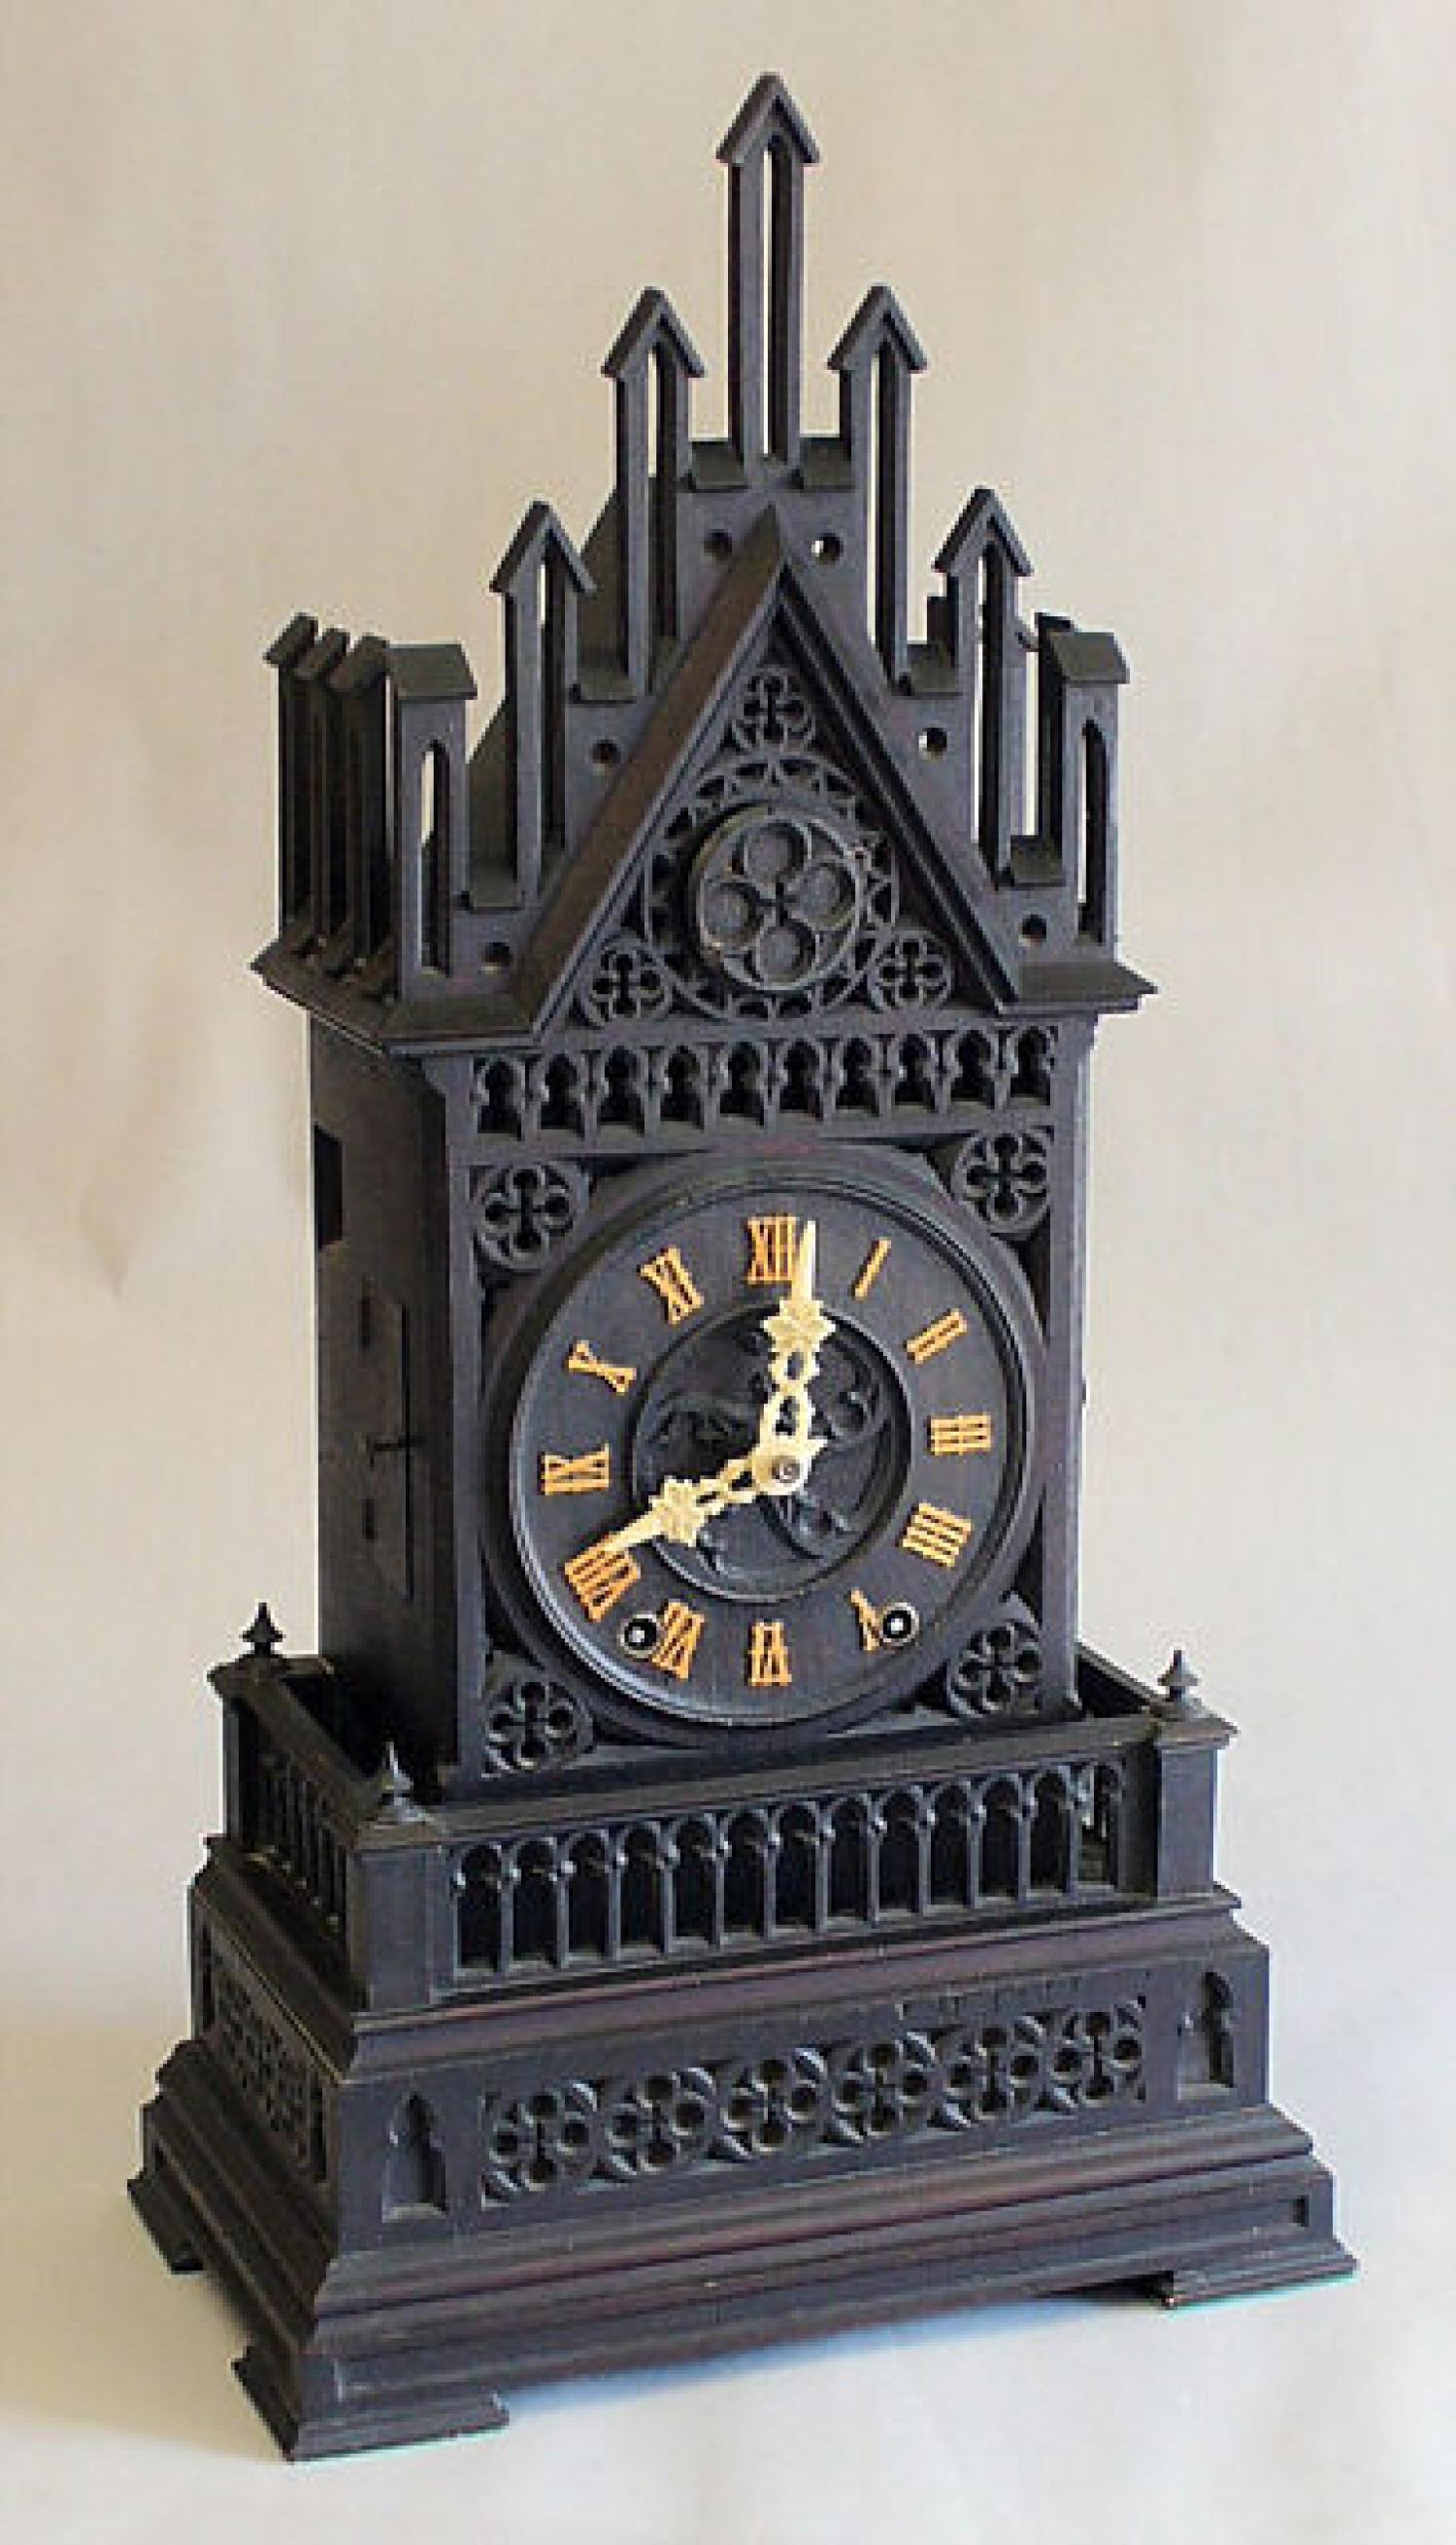 Antique shelf cuckoo clock Germany circa 1850